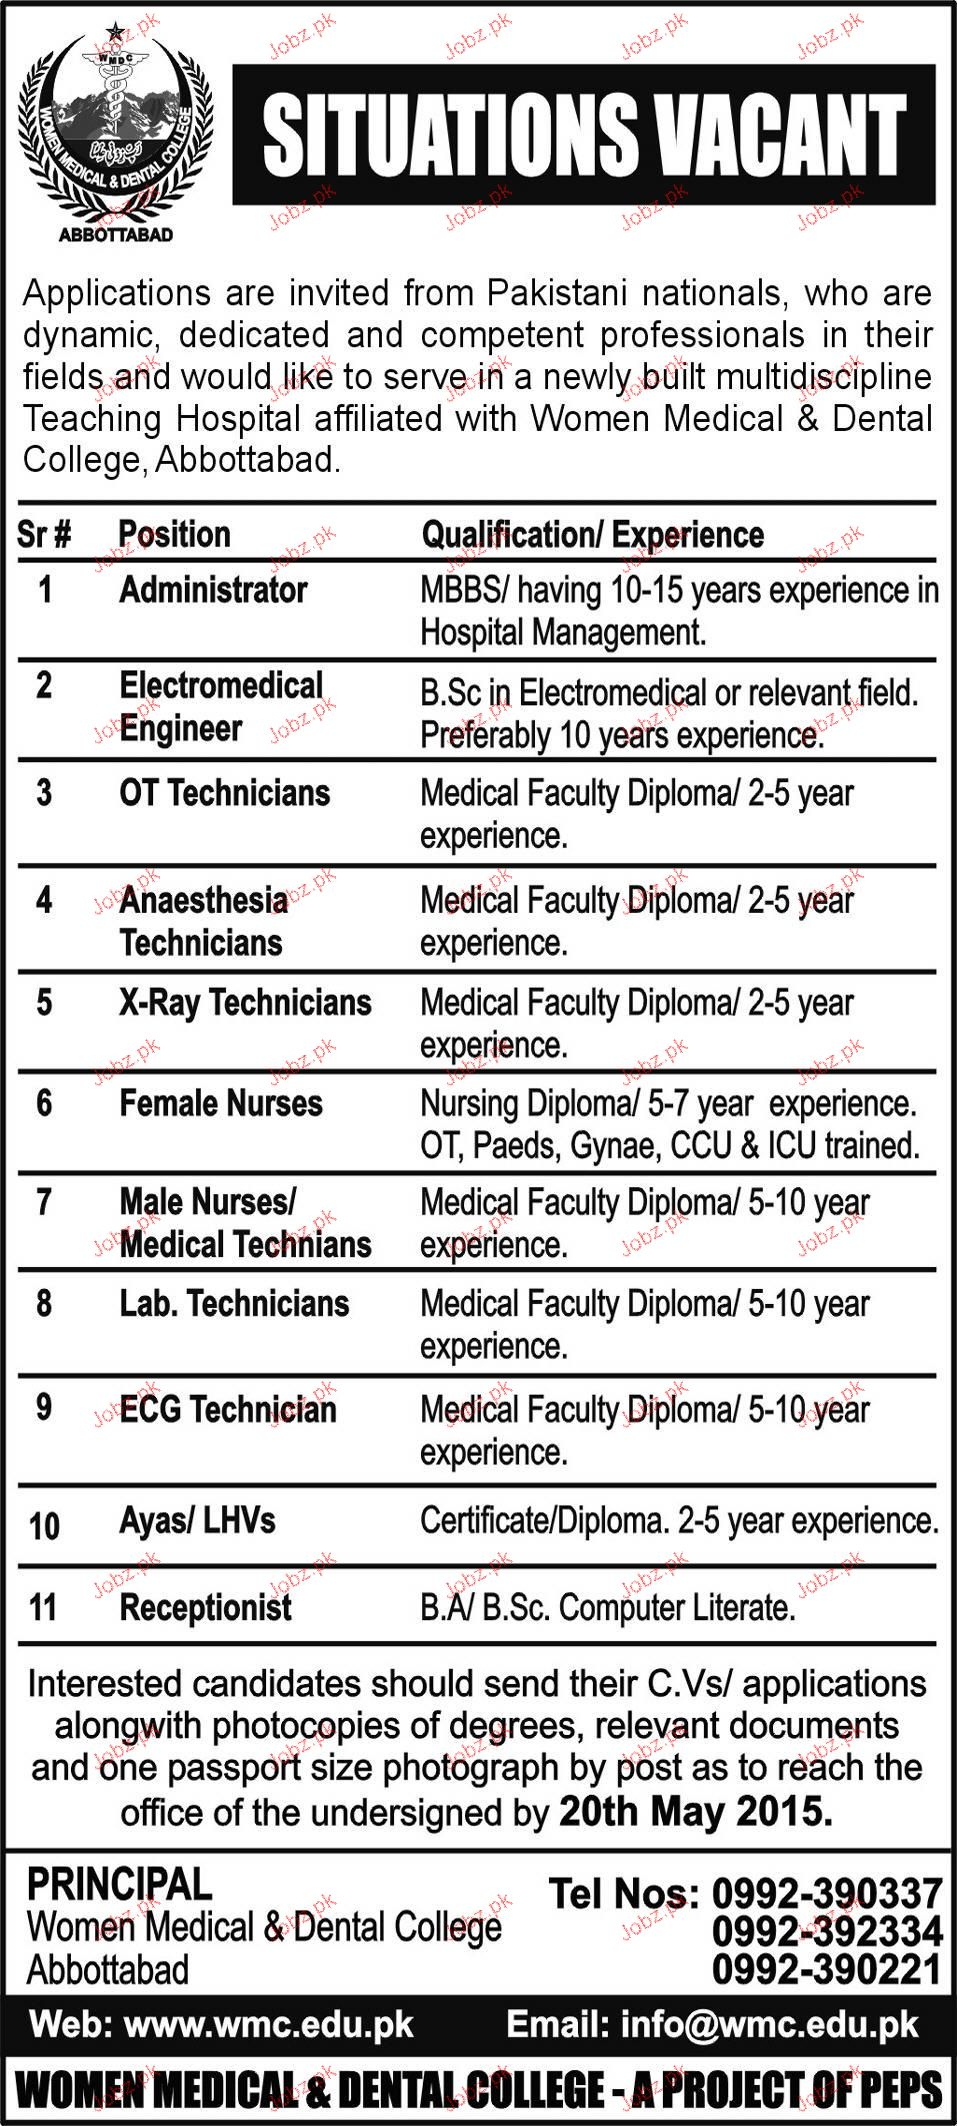 Administrators, OT Technicians Job Opportunity